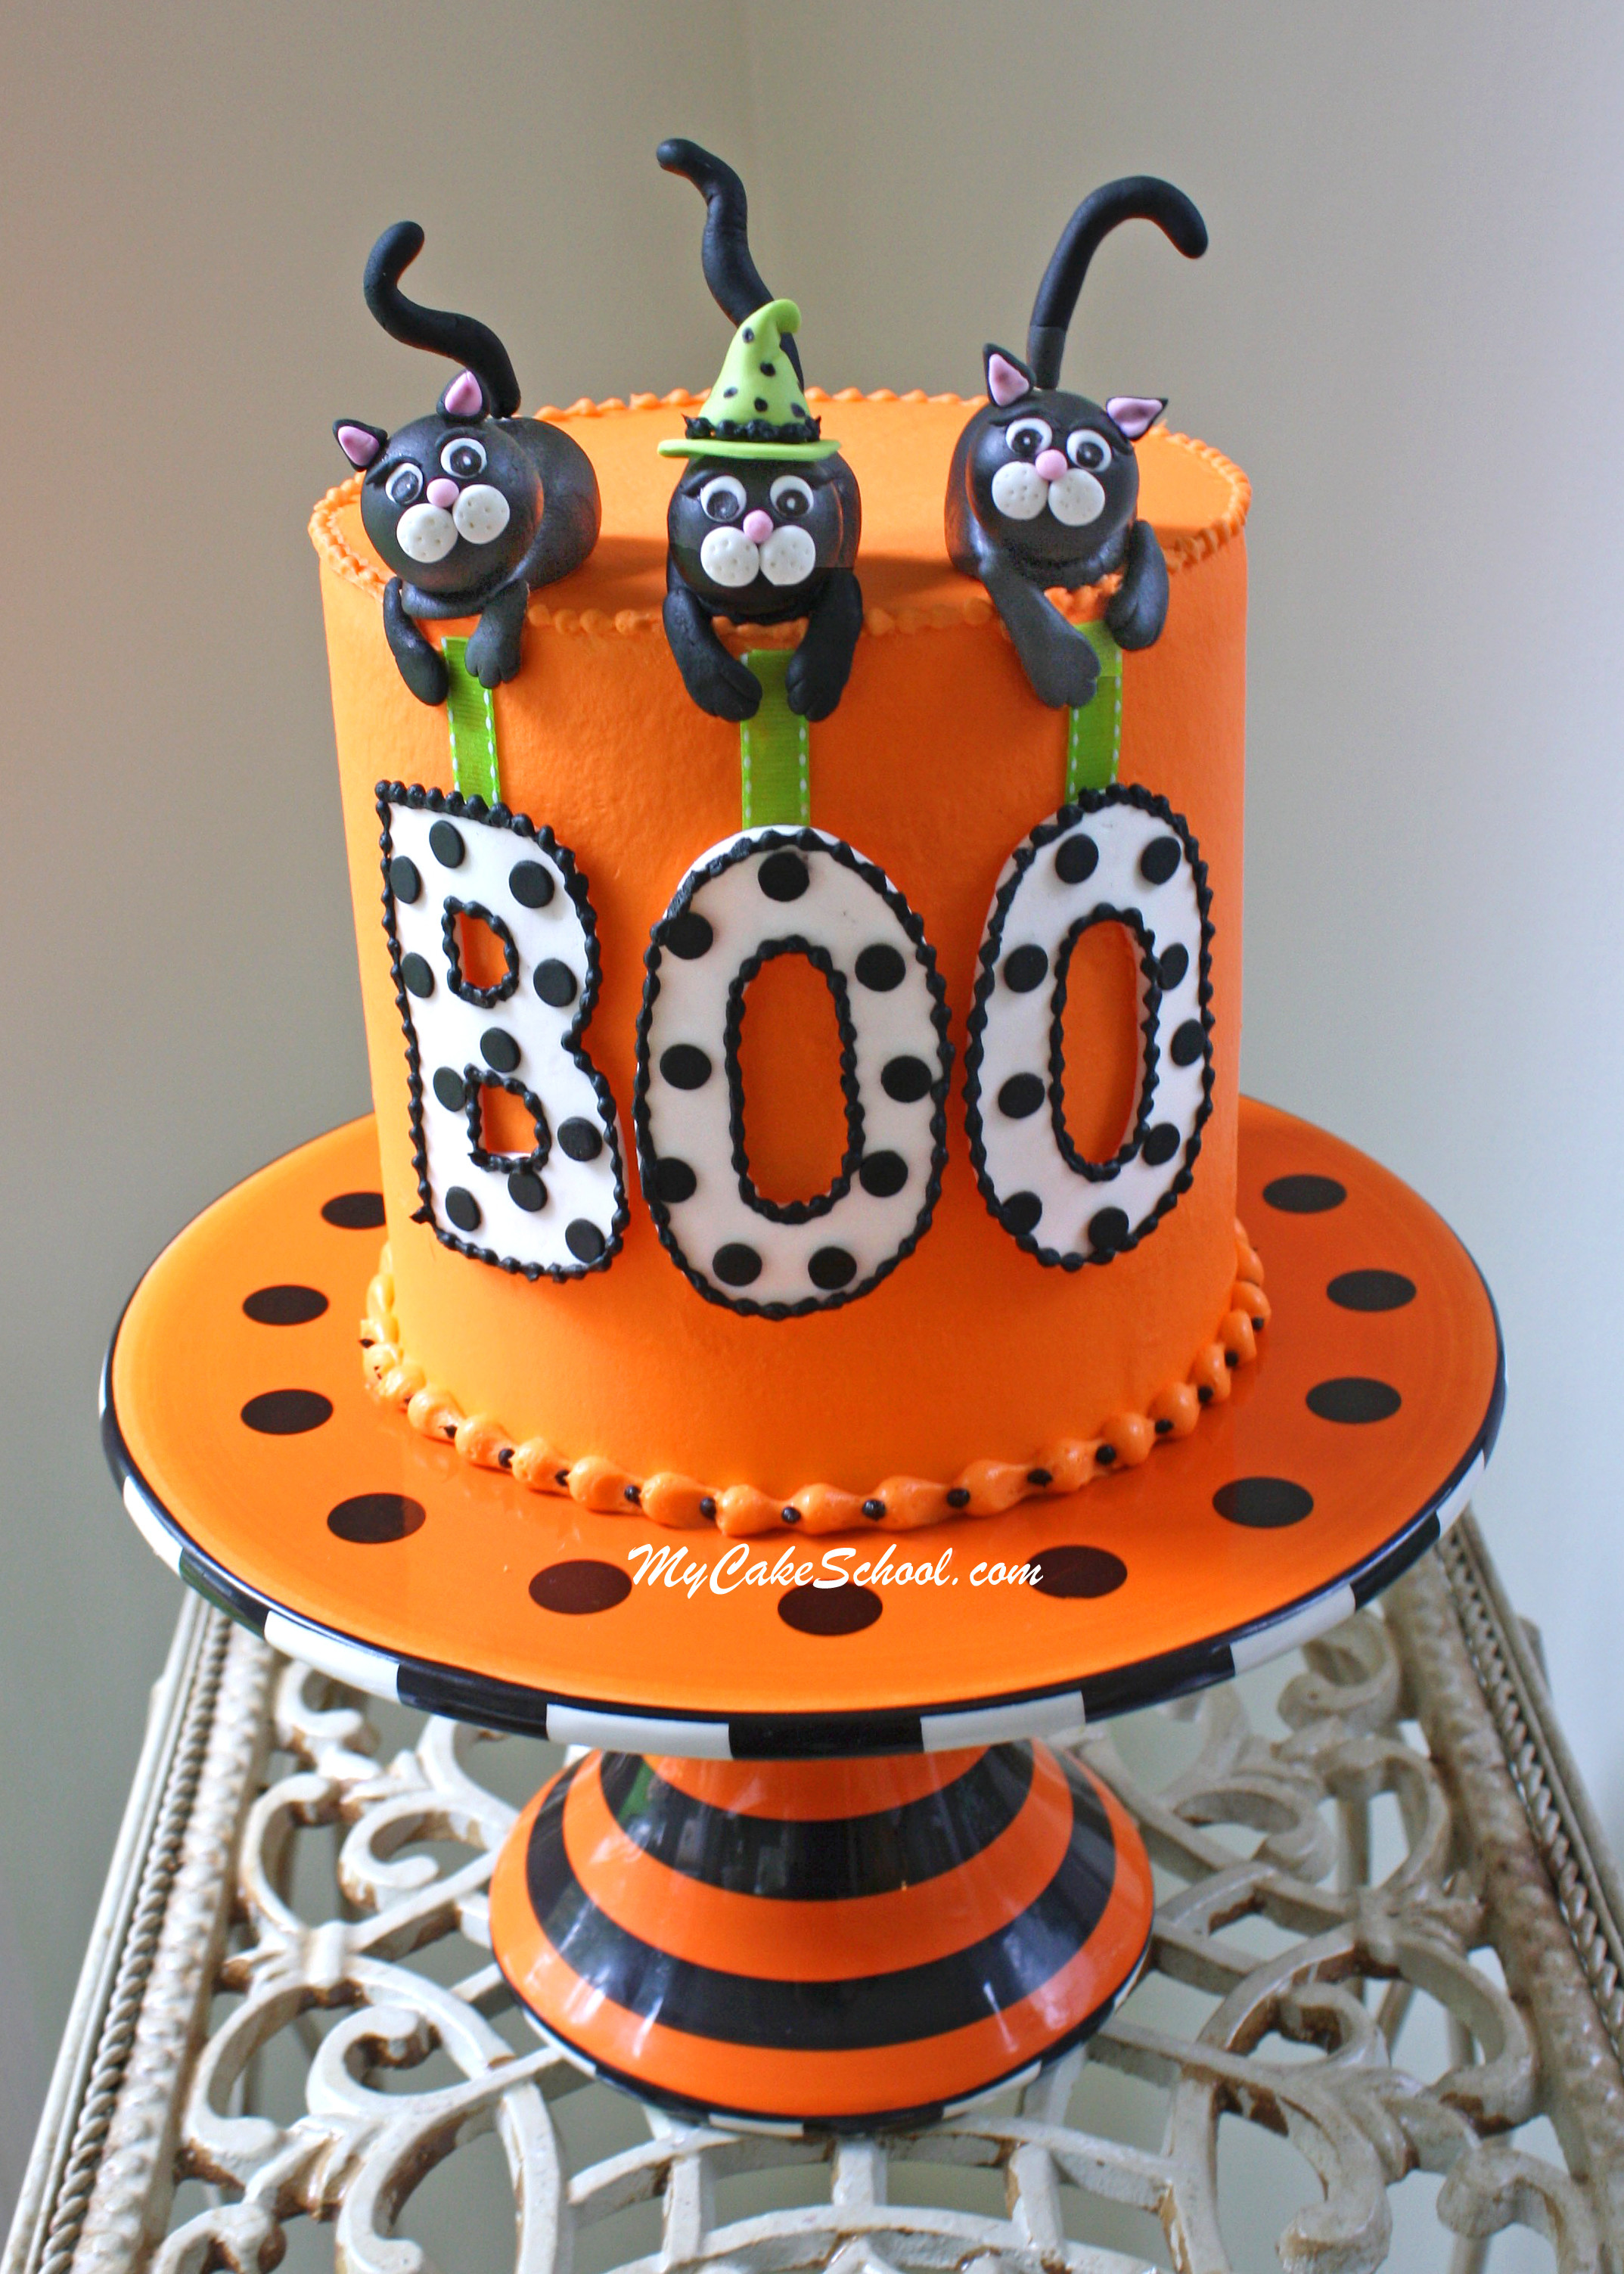 Fun Halloween Cakes  Roundup of the BEST Halloween Cakes Tutorials and Ideas